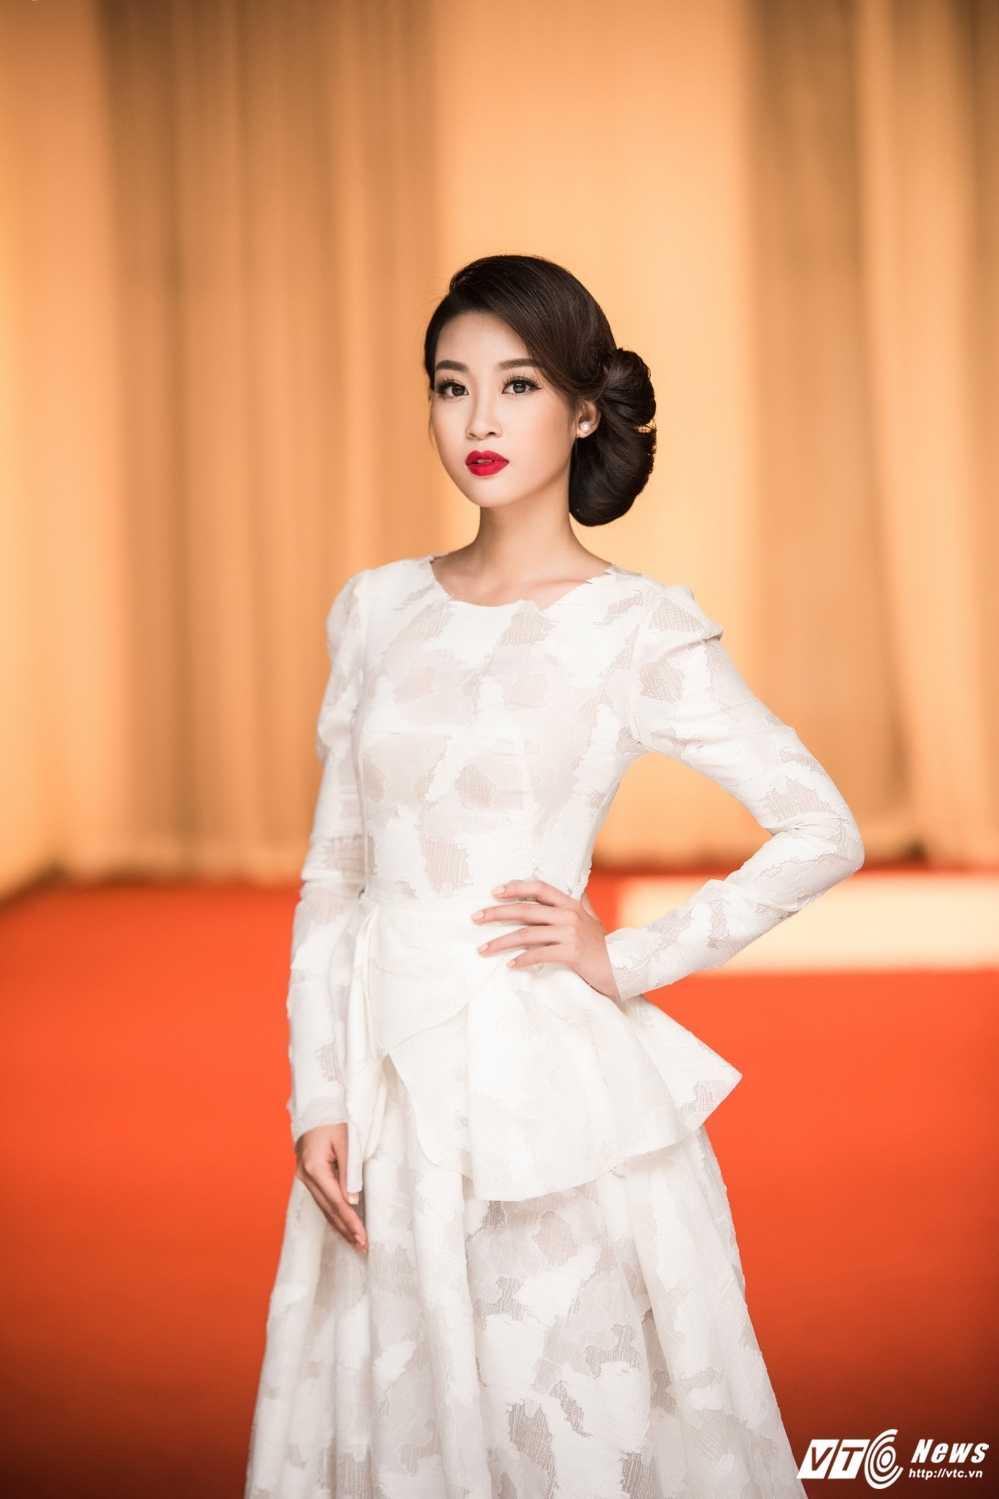 Hoa hau My Linh do sac voi chi em A hau Thanh Tu -Tra My hinh anh 5